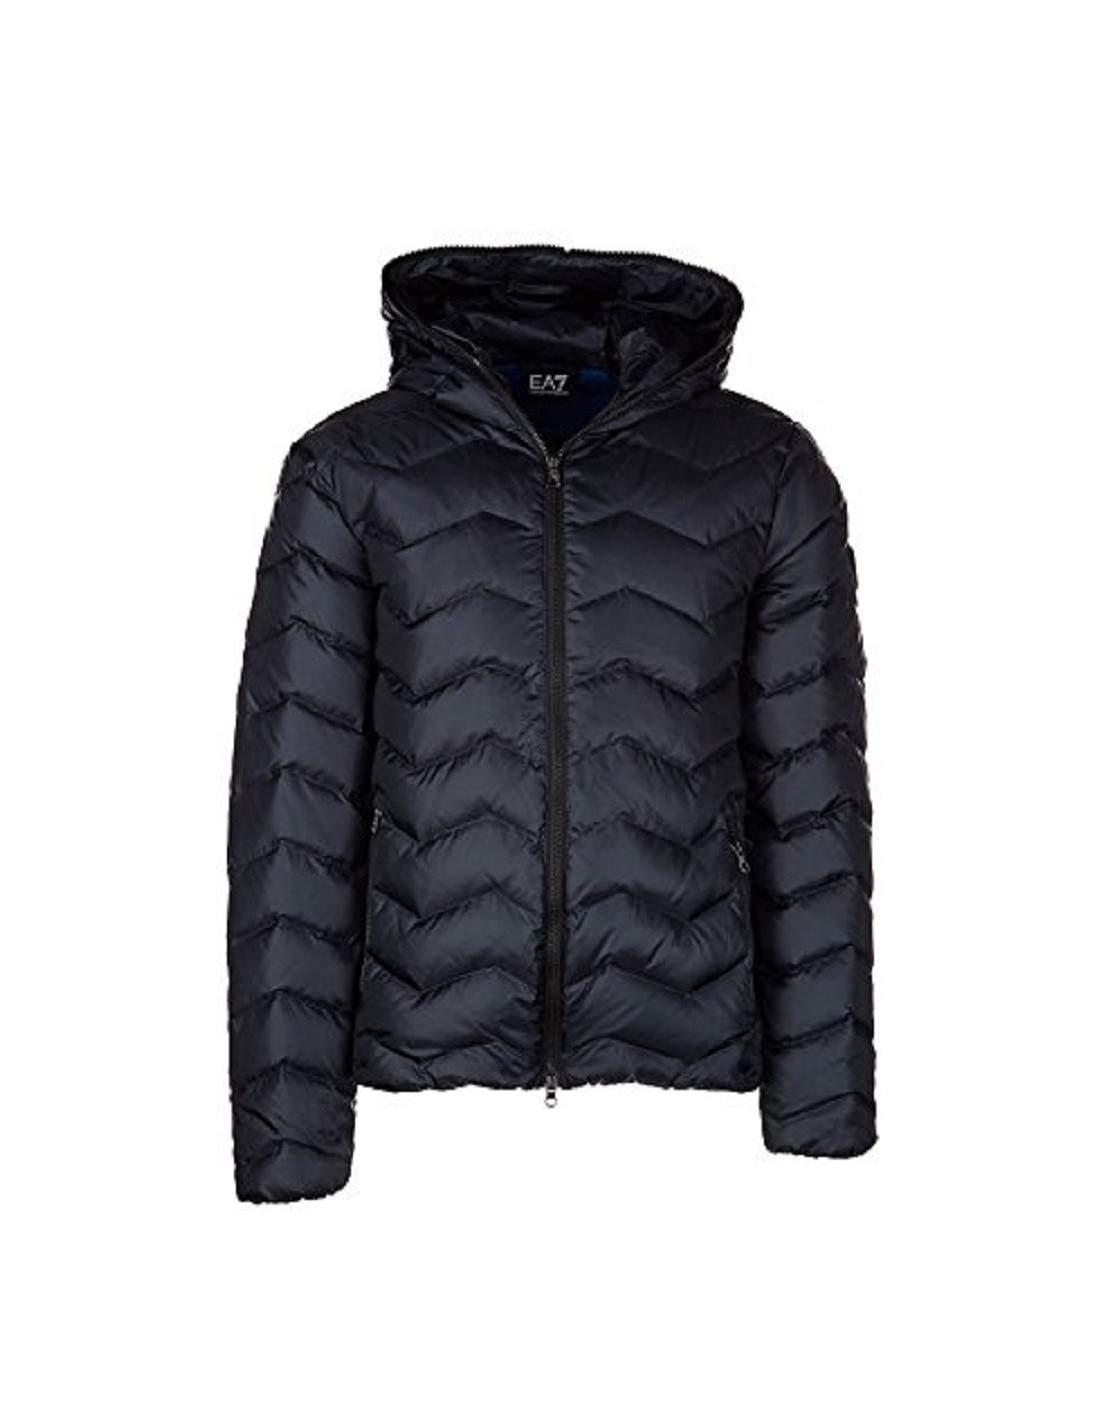 efa067aa4307f Jacket EA7 Emporio Armani Man 6YPB15 PN22Z 178 night blue, Fashion ...